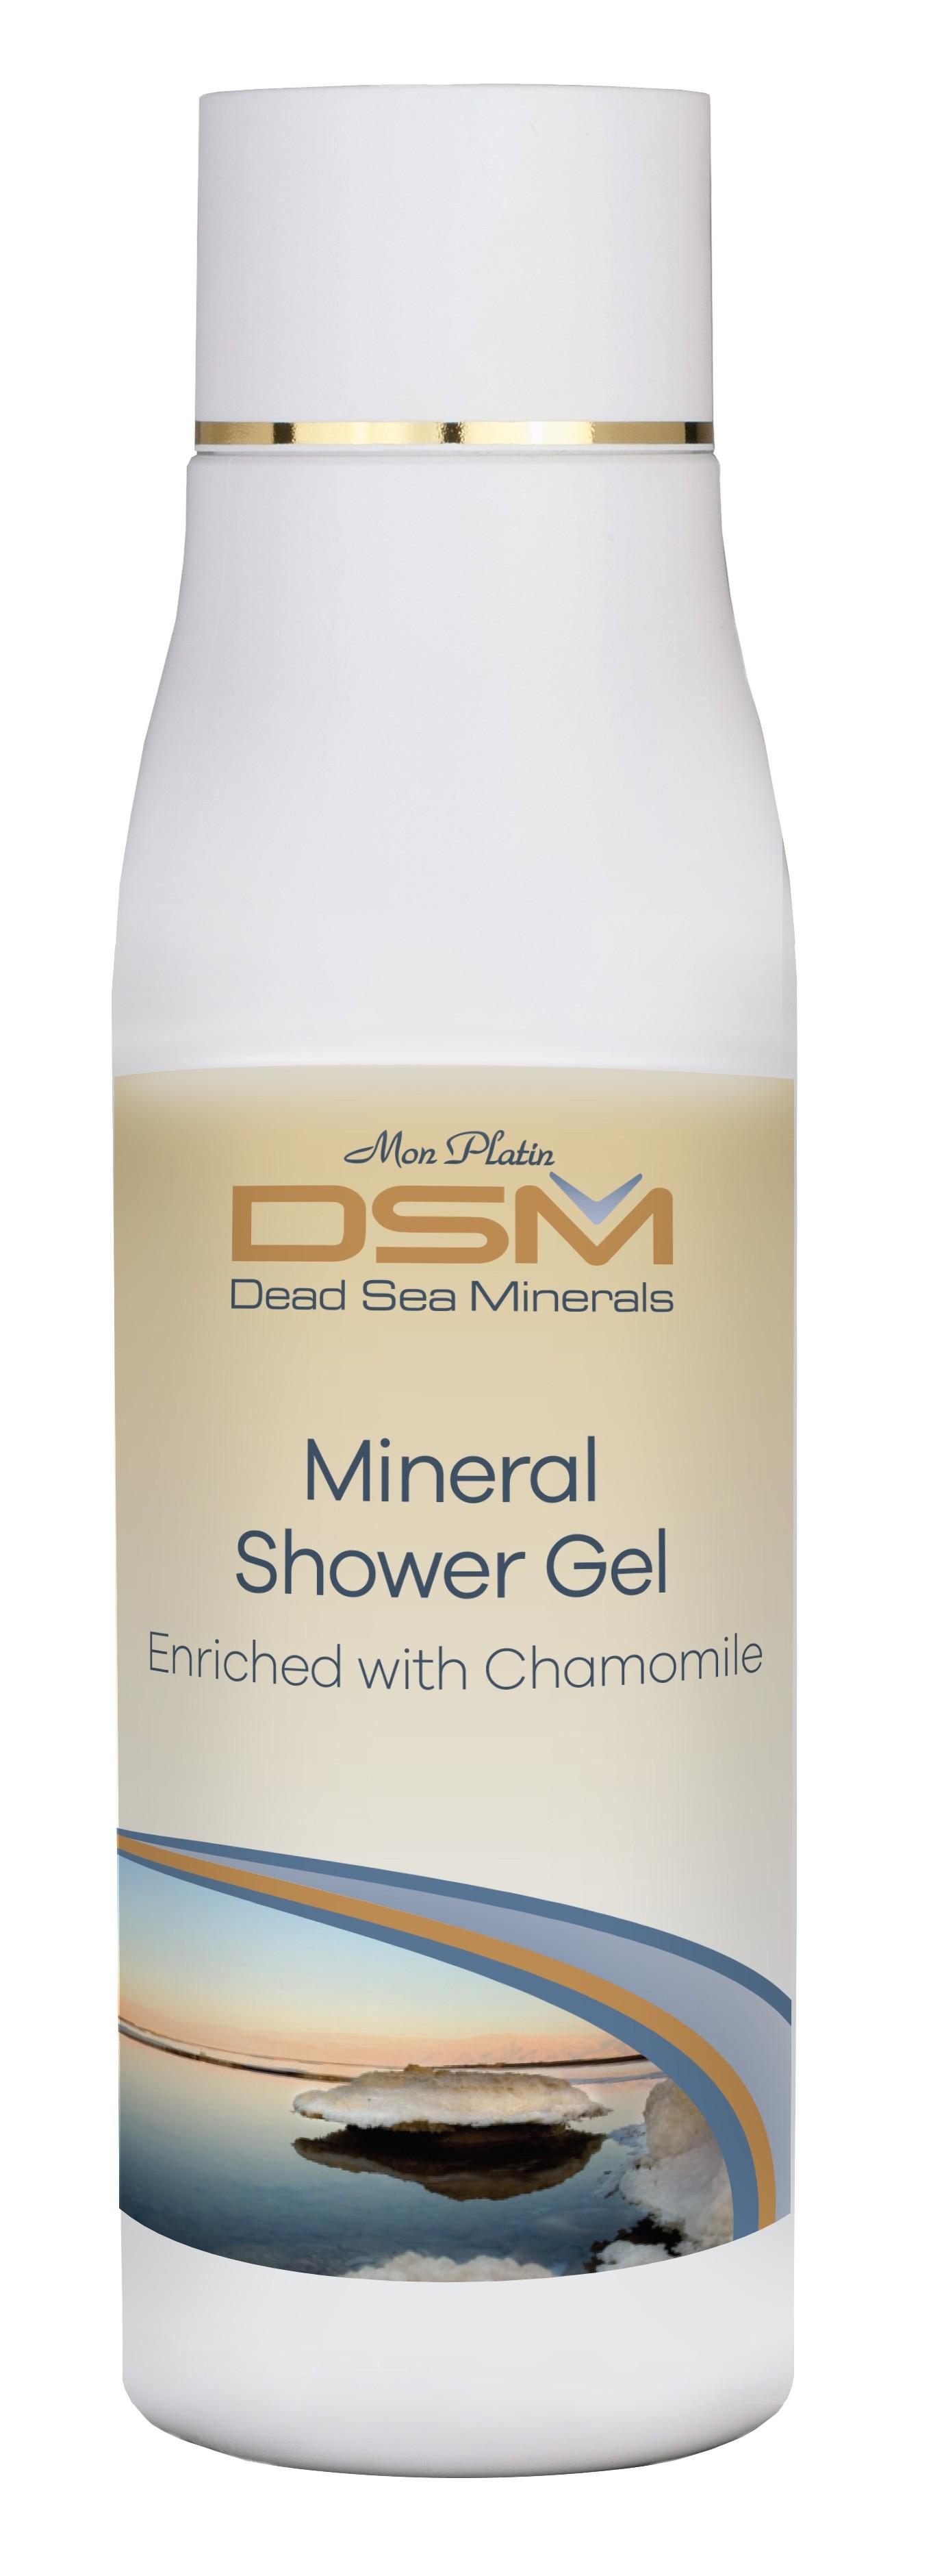 Mineral Shower Gel enriched with Chamomile DSM